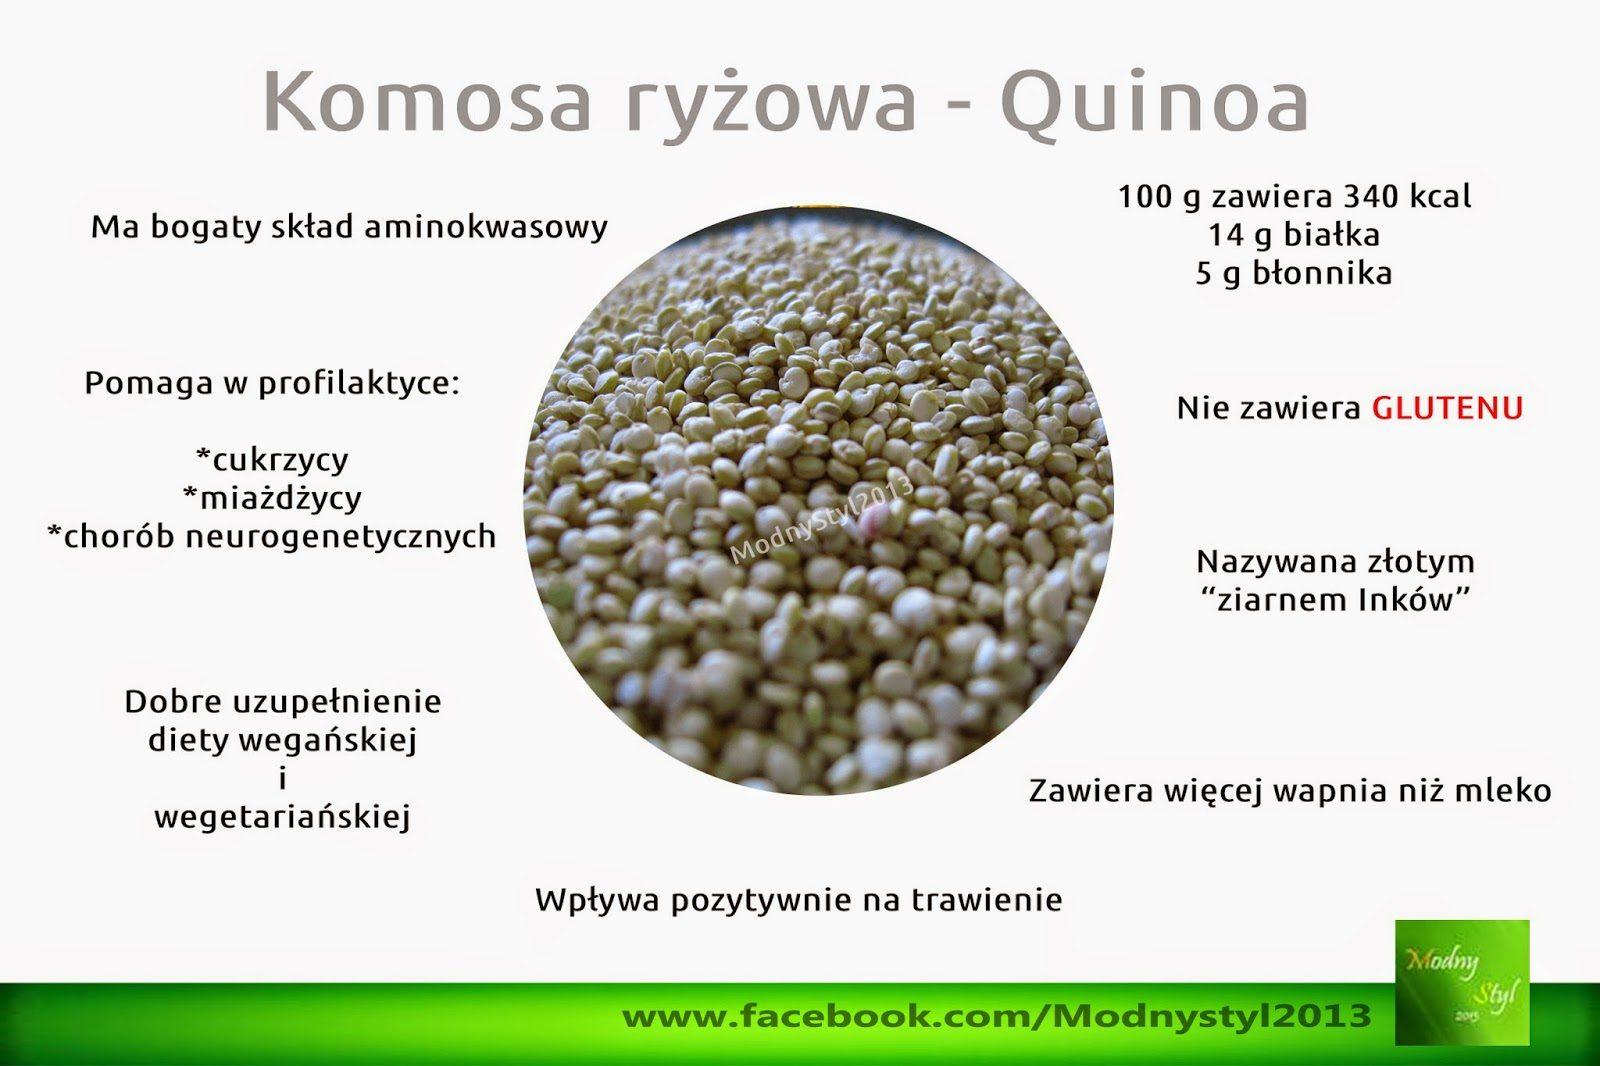 komosa2bryc5bcowa-8655128